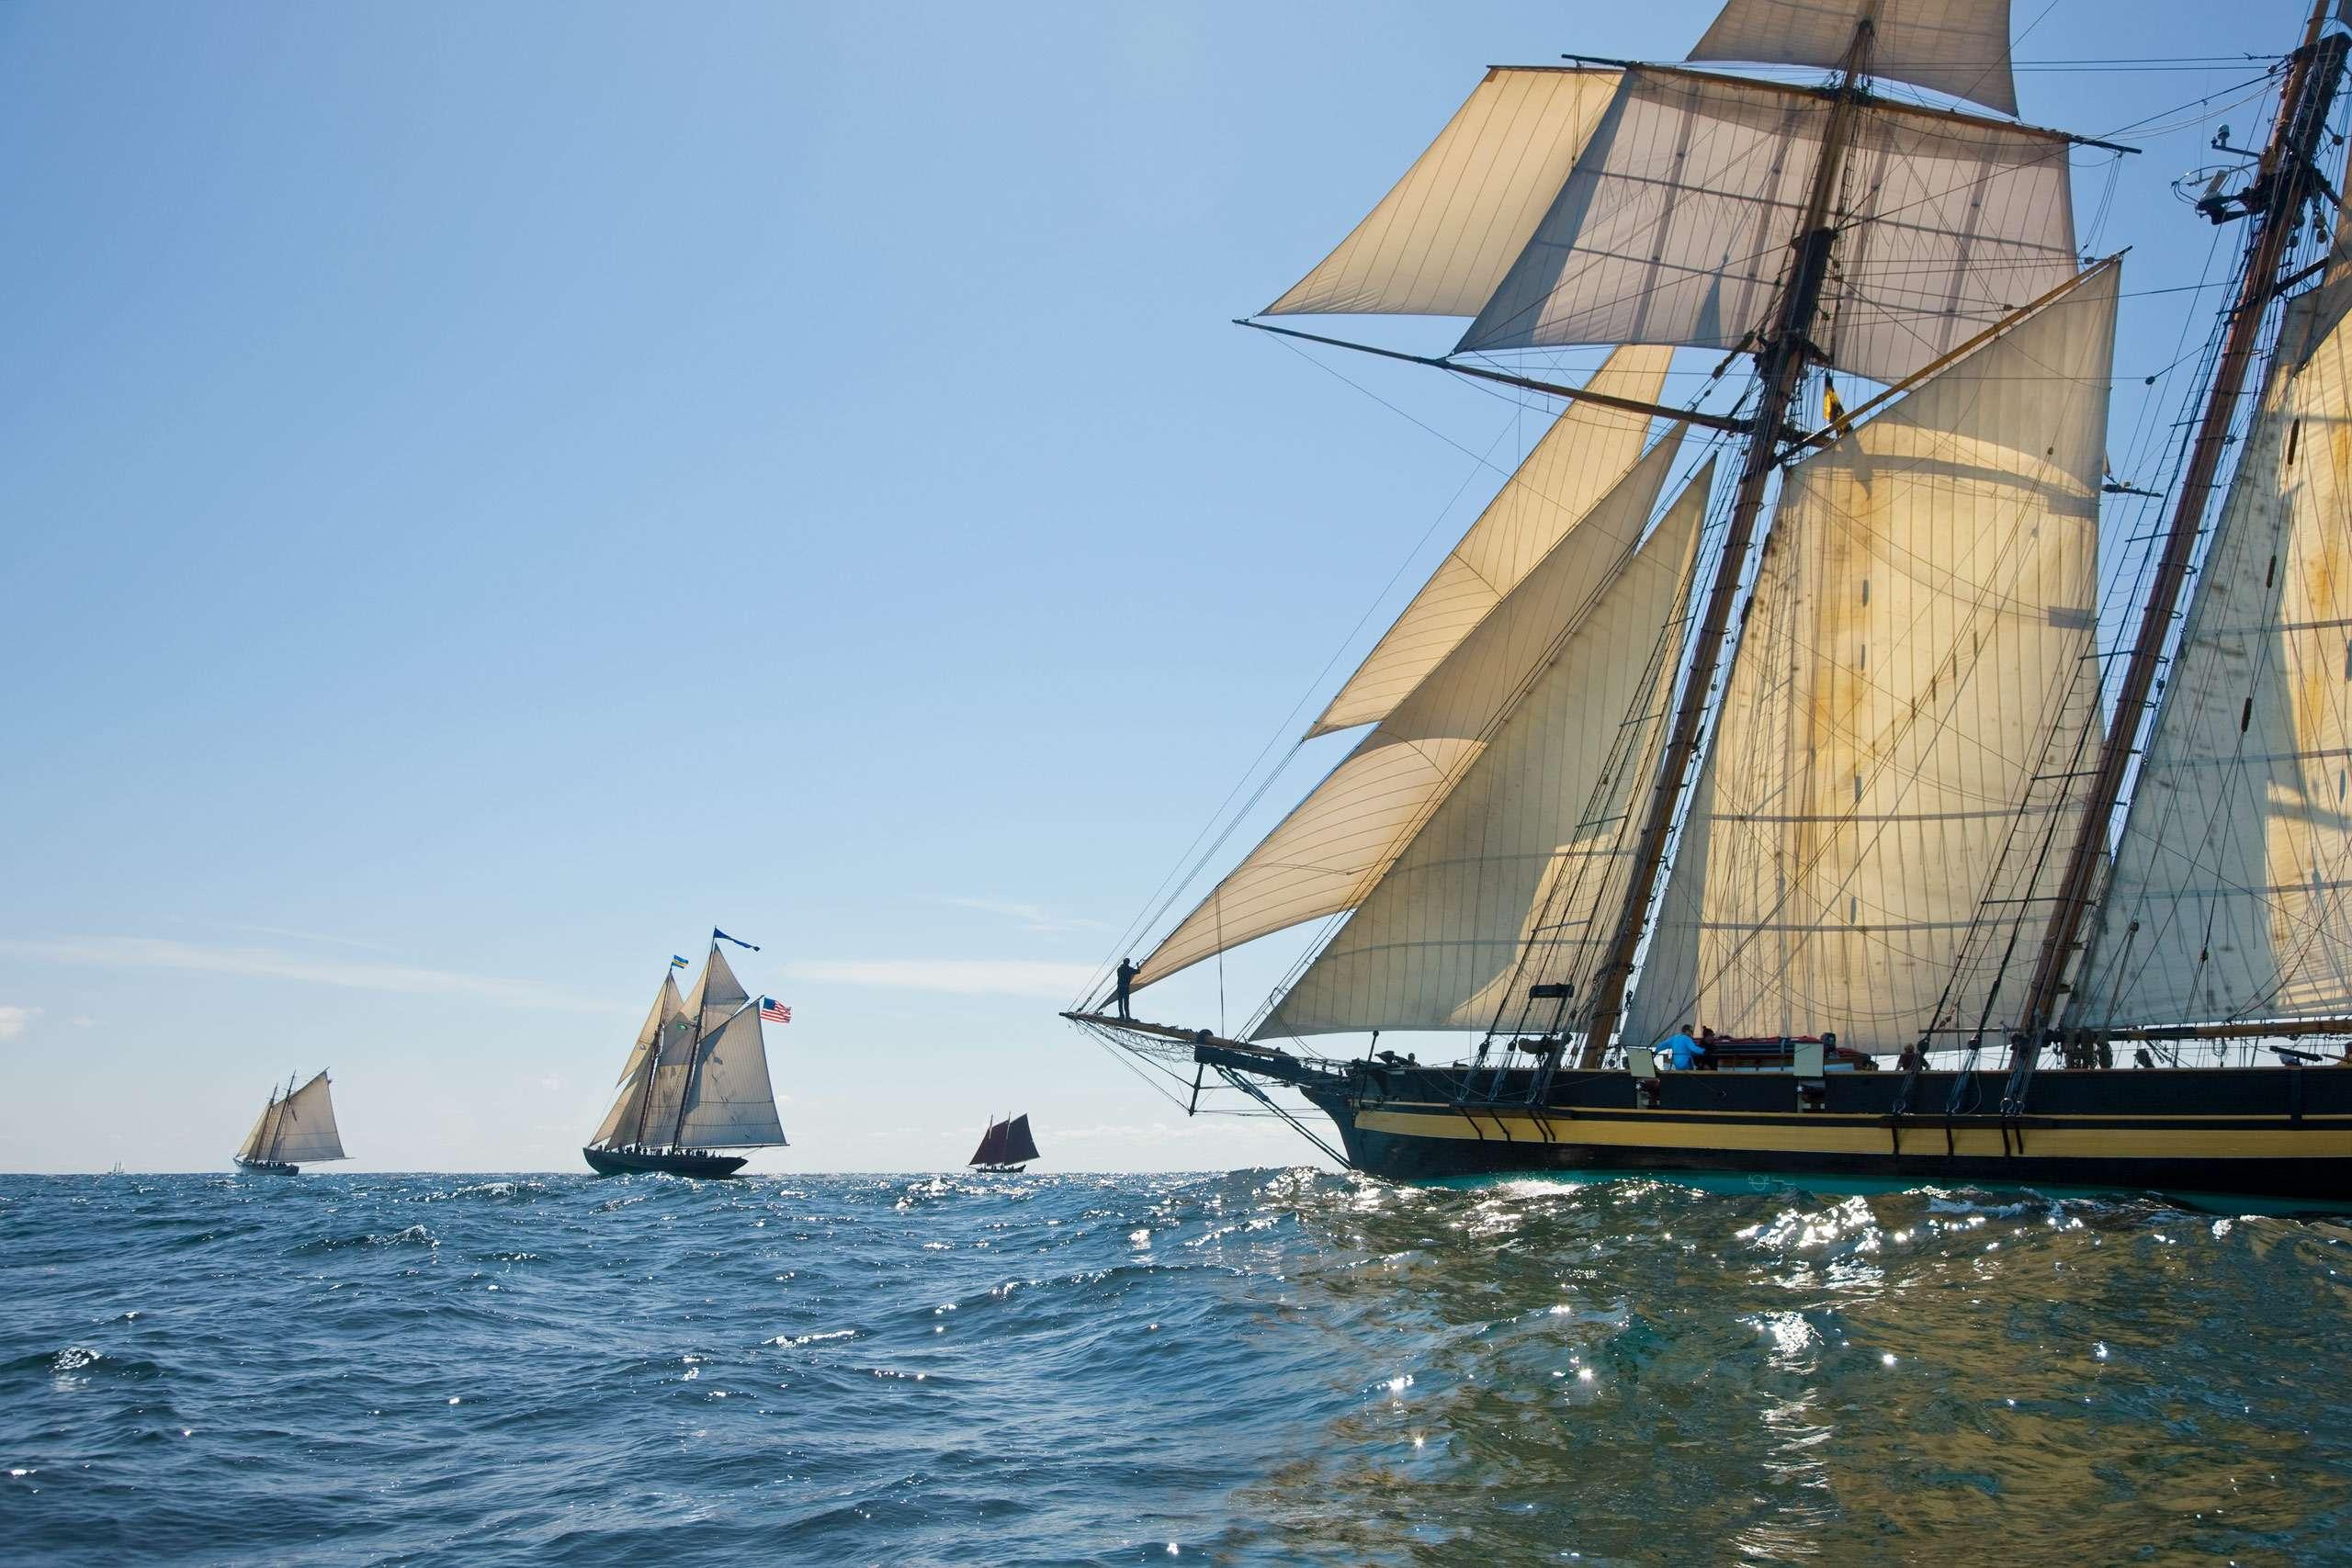 PORTFOLIO - Sailing - Windjammers #5    PCG449